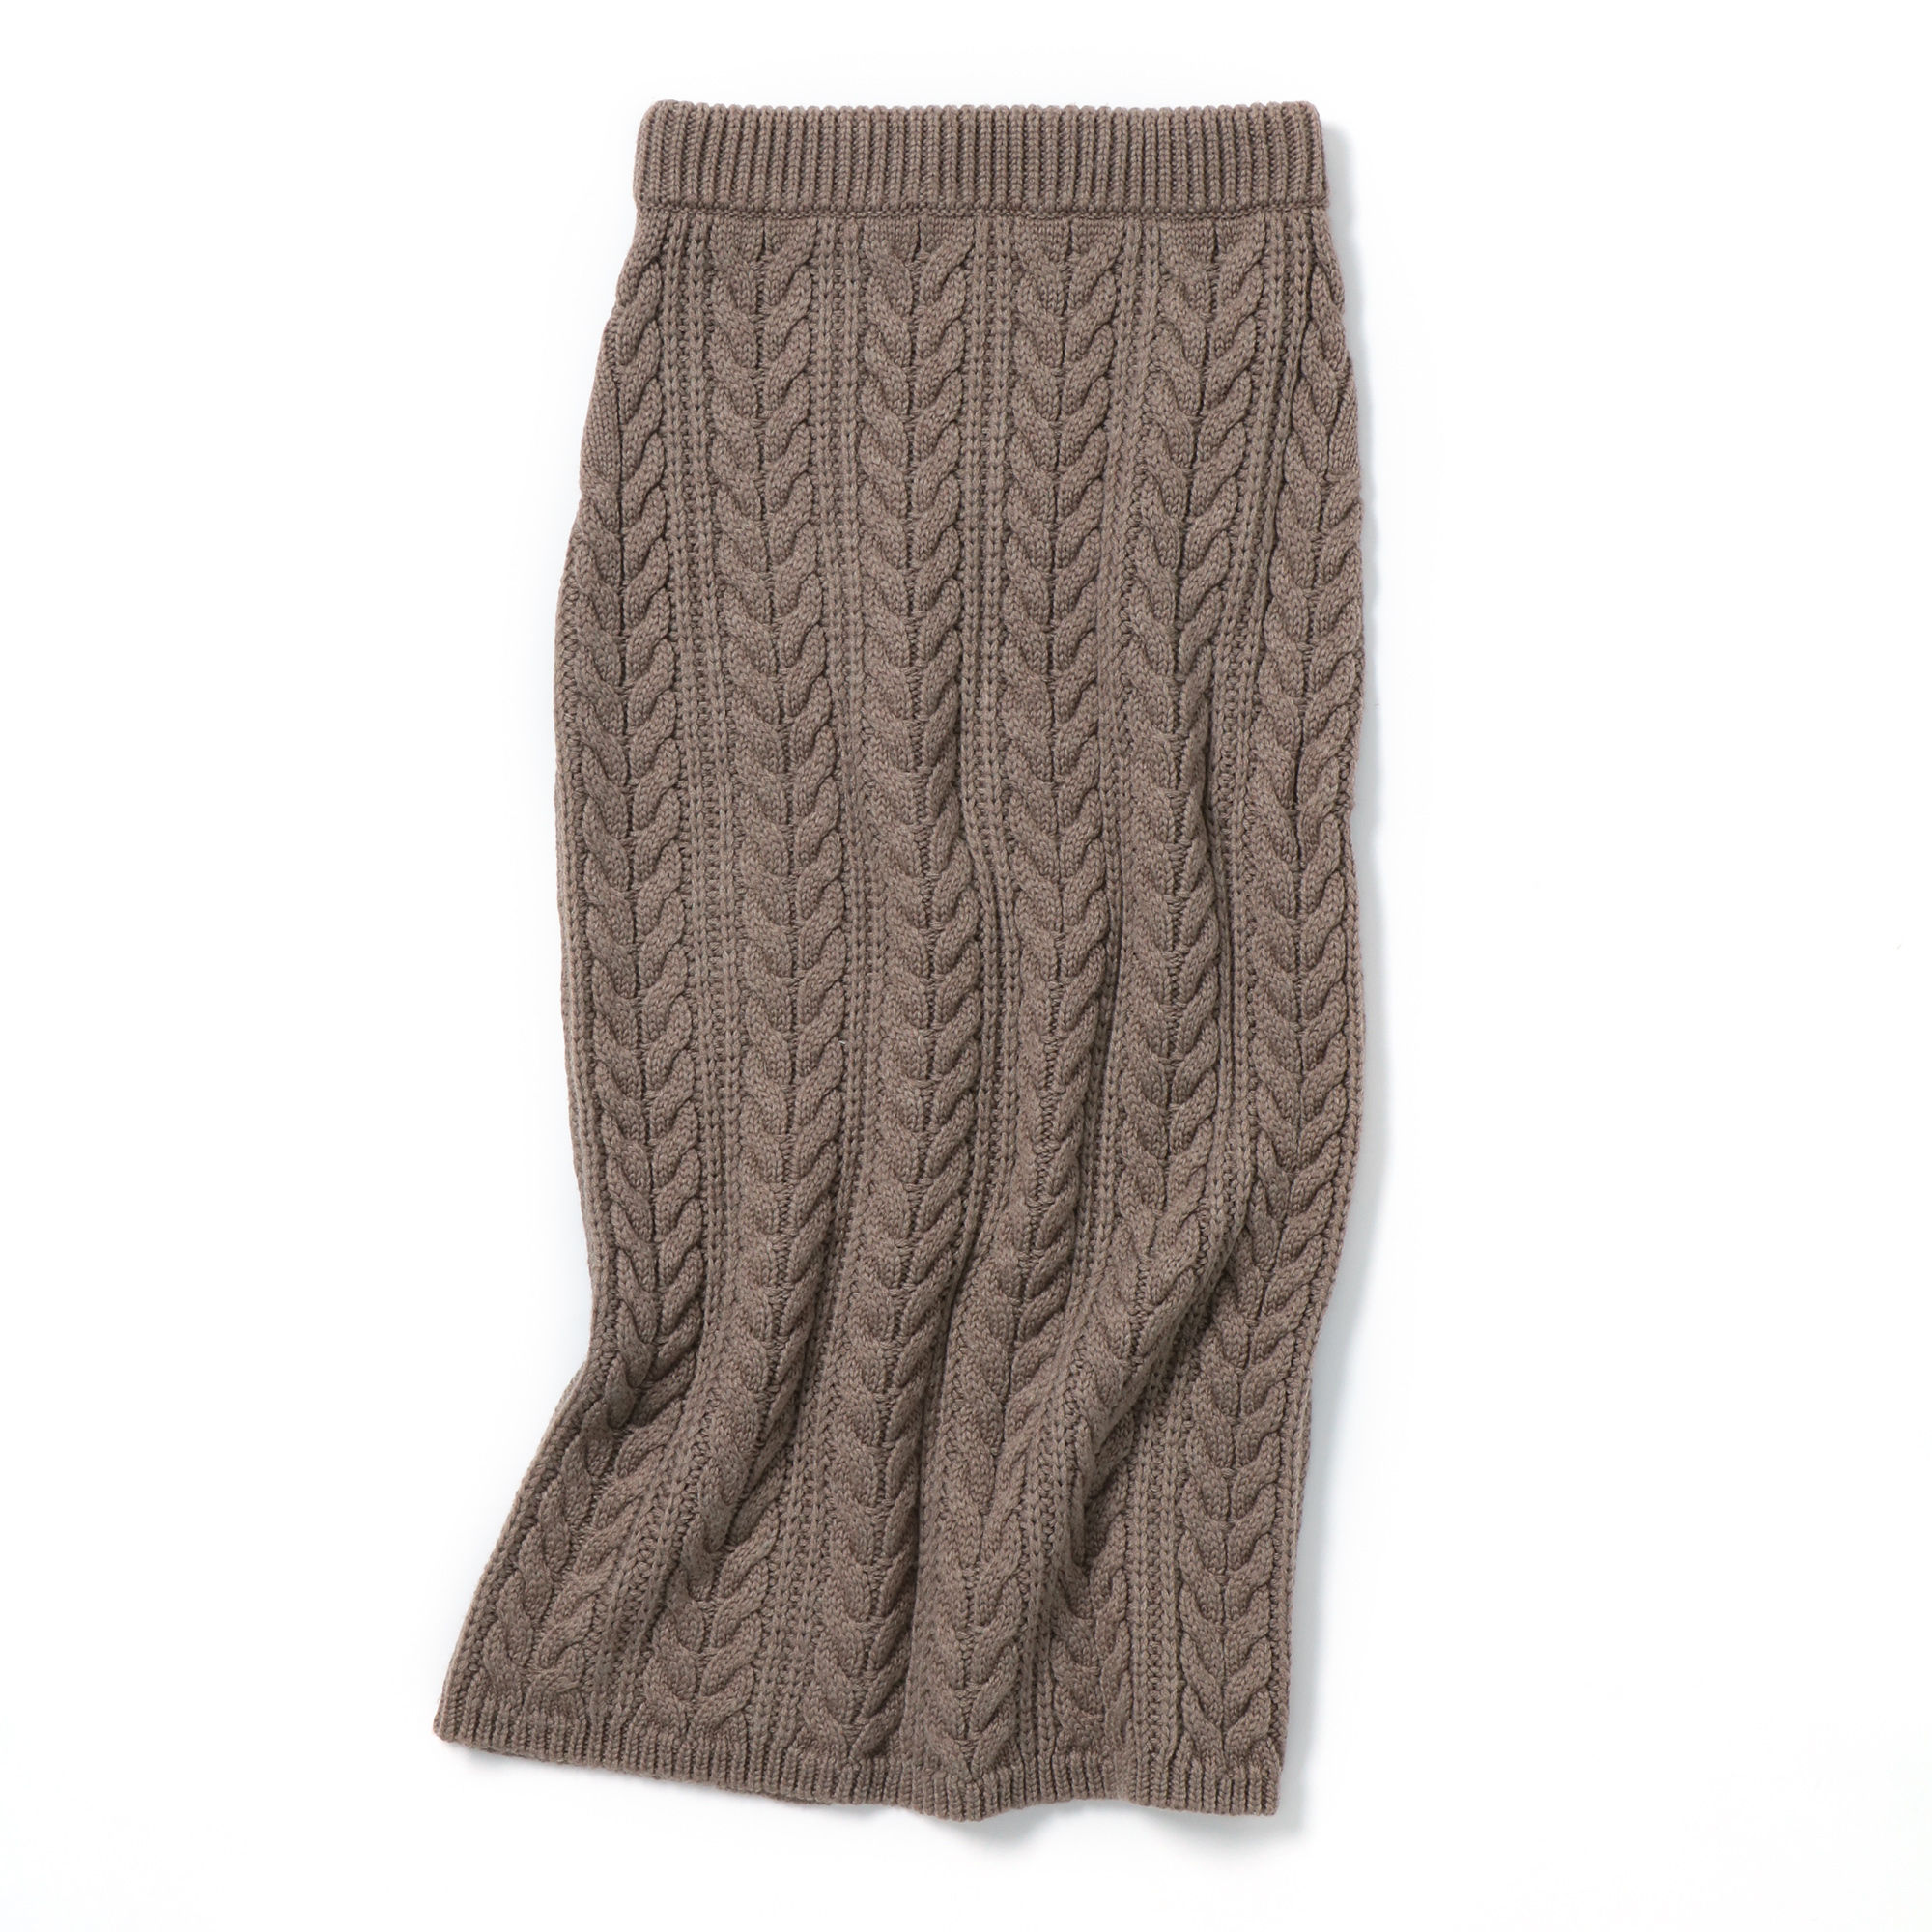 M7days (エムセブンデイズ) ケーブル柄ニットスカート